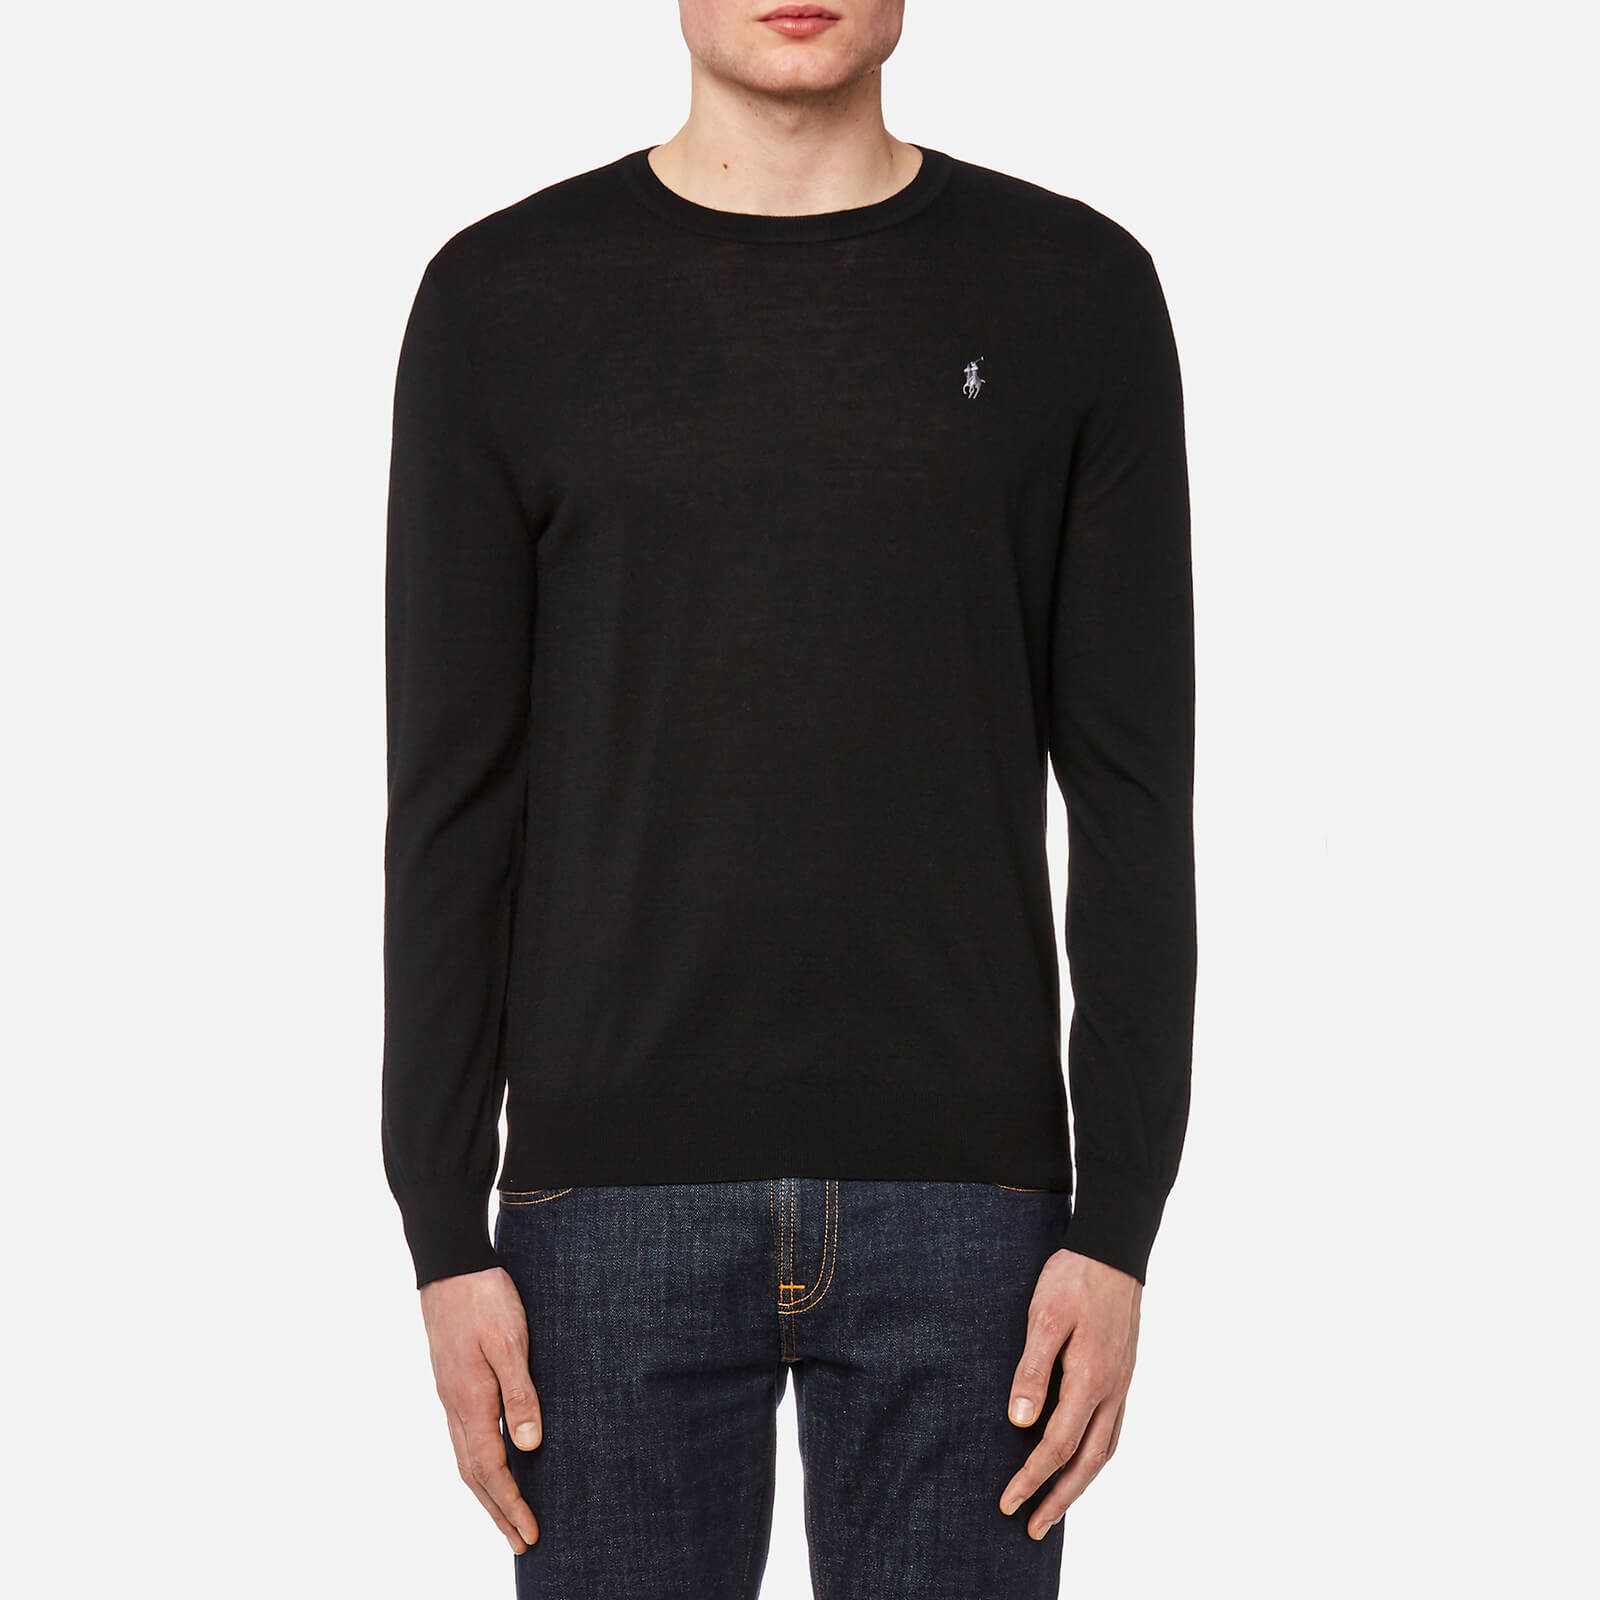 9eaf8a4a9de9 Polo Ralph Lauren Men s Merino Wool Long Sleeve Jumper - Polo Black - Free  UK Delivery over £50